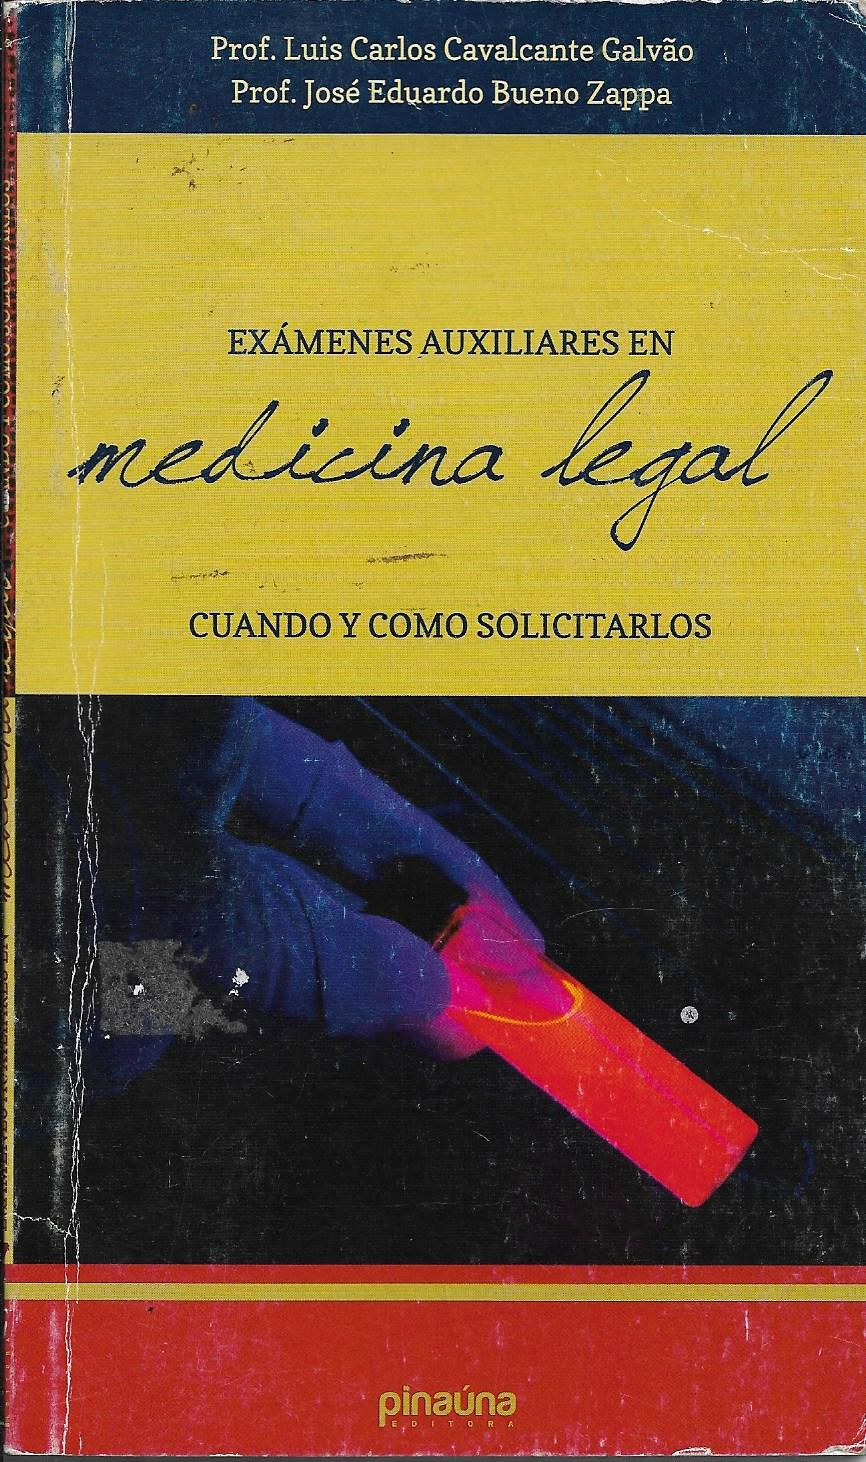 Exámenes Auxiliares en Medicina Legal